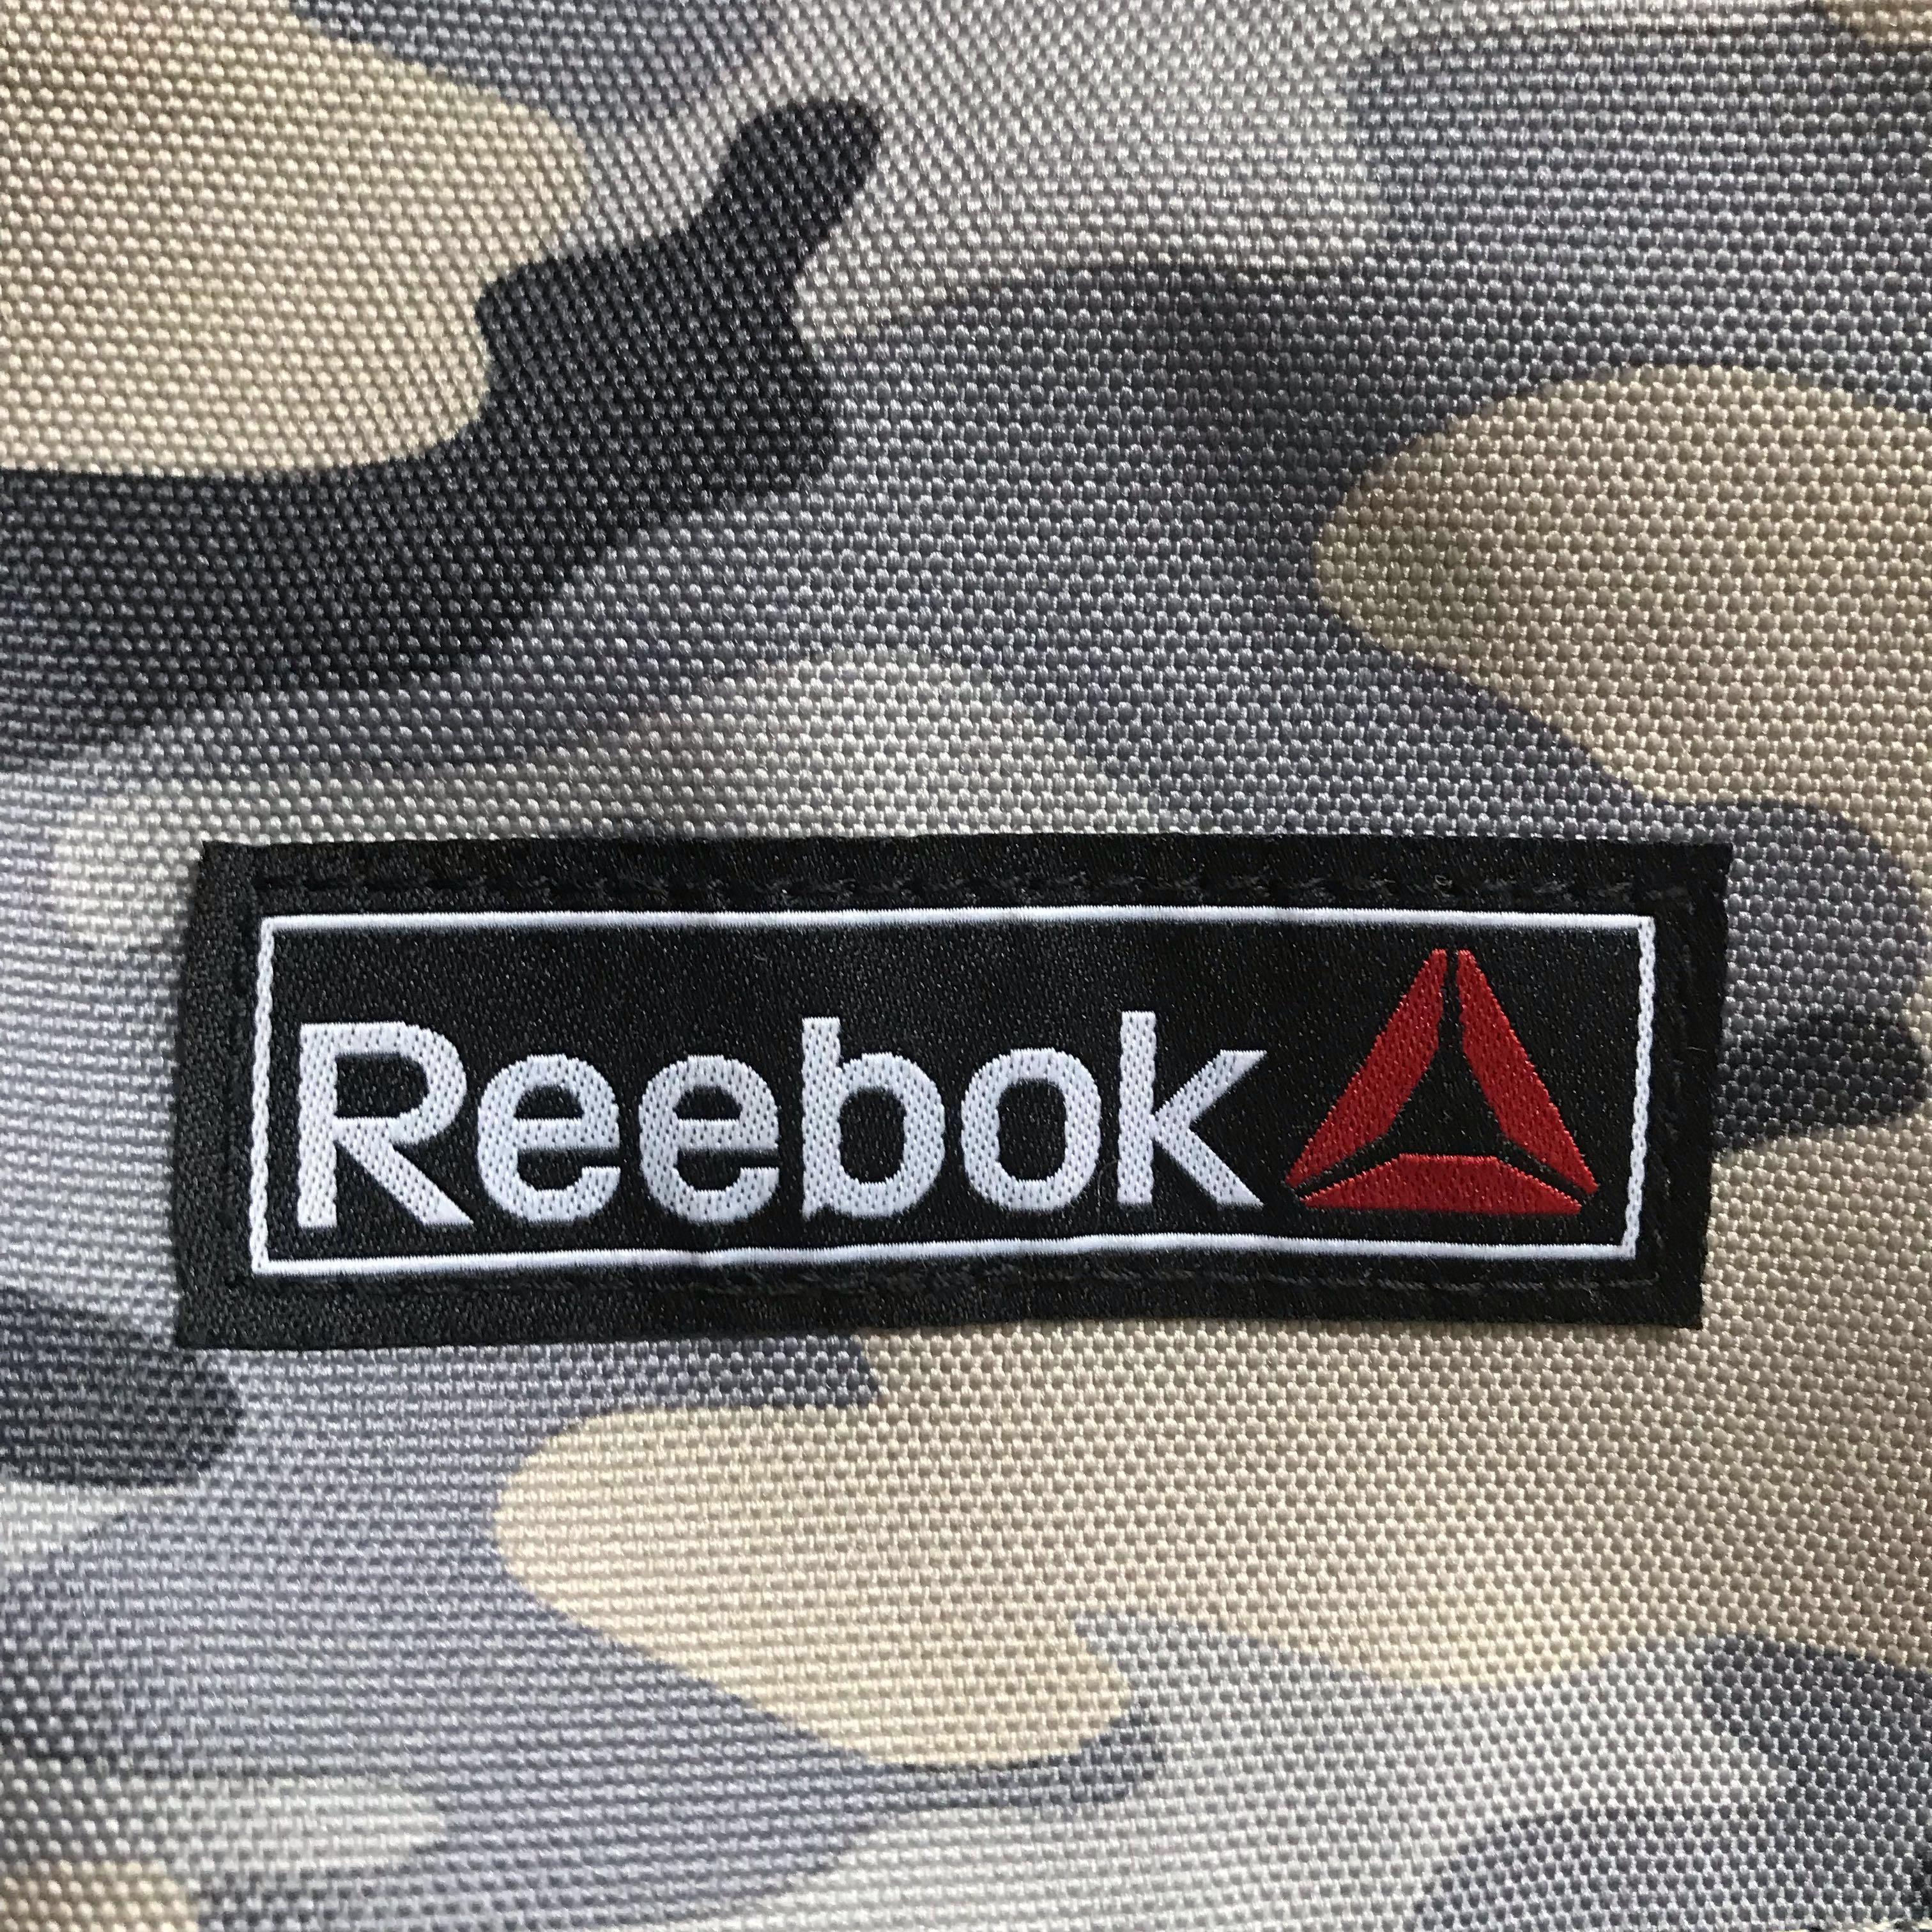 Reebok camouflage backpack 潮牌運動迷彩背囊背包 名牌書包